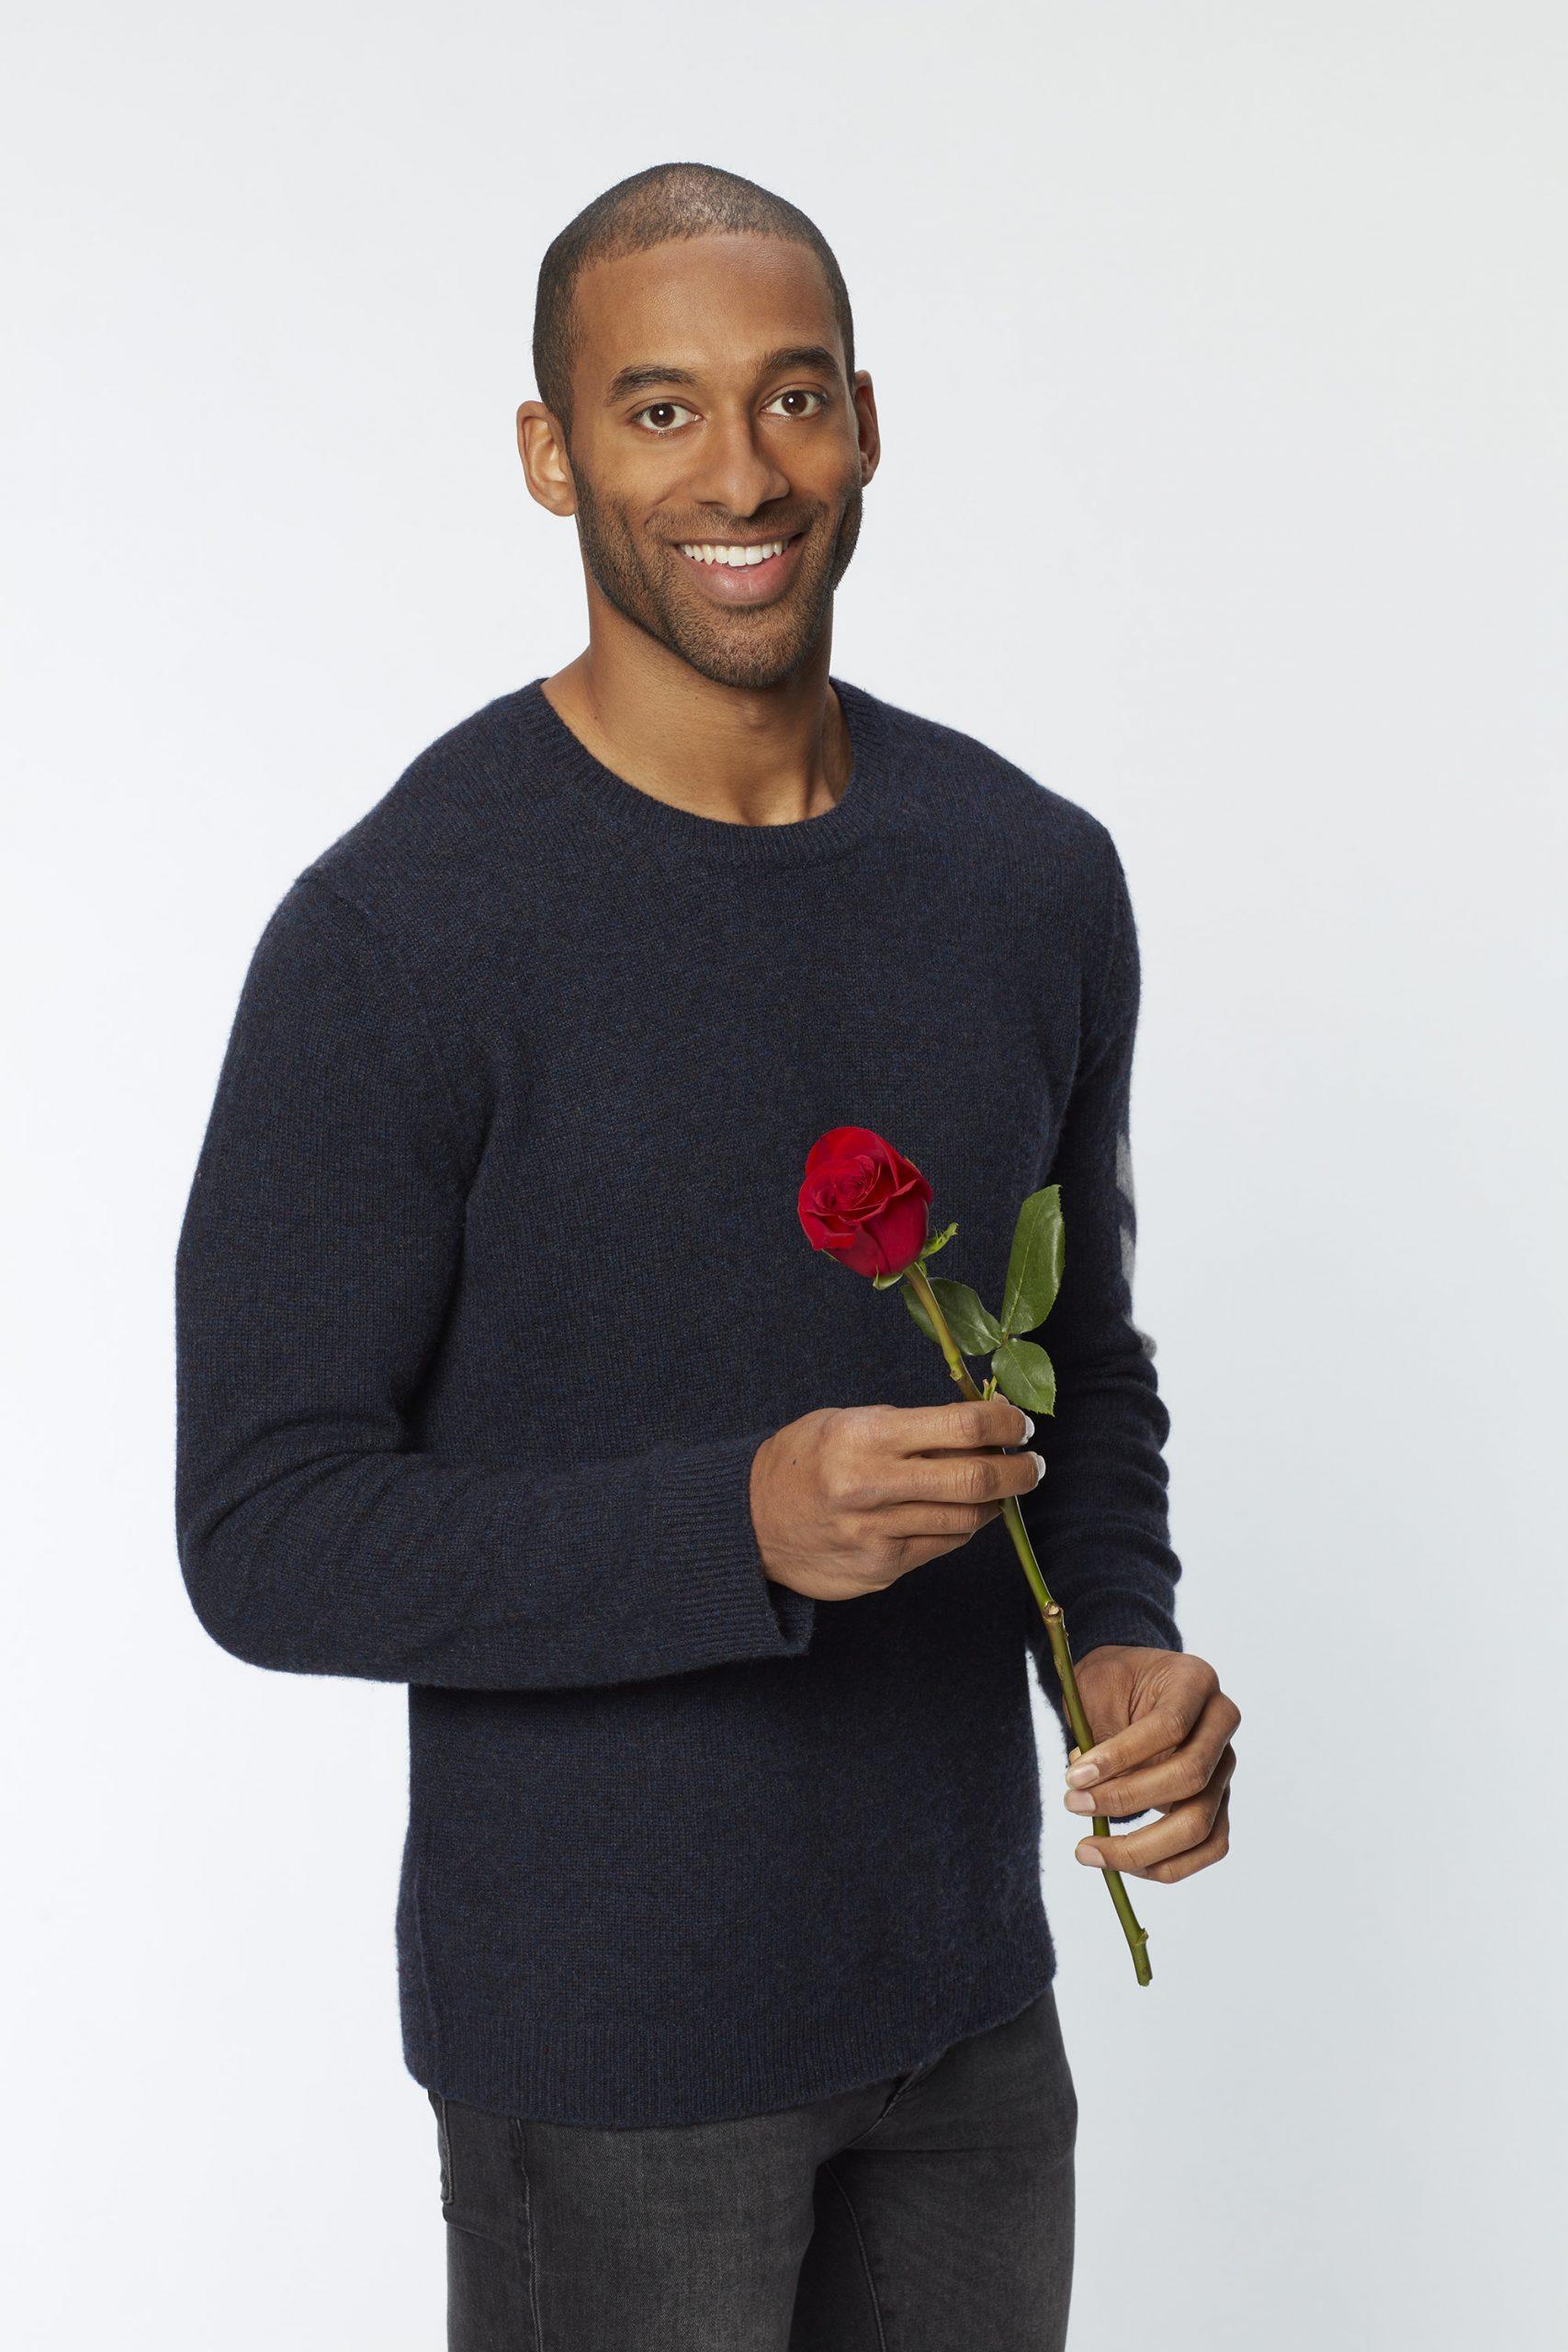 Matt James Is The New Bachelor On ABC